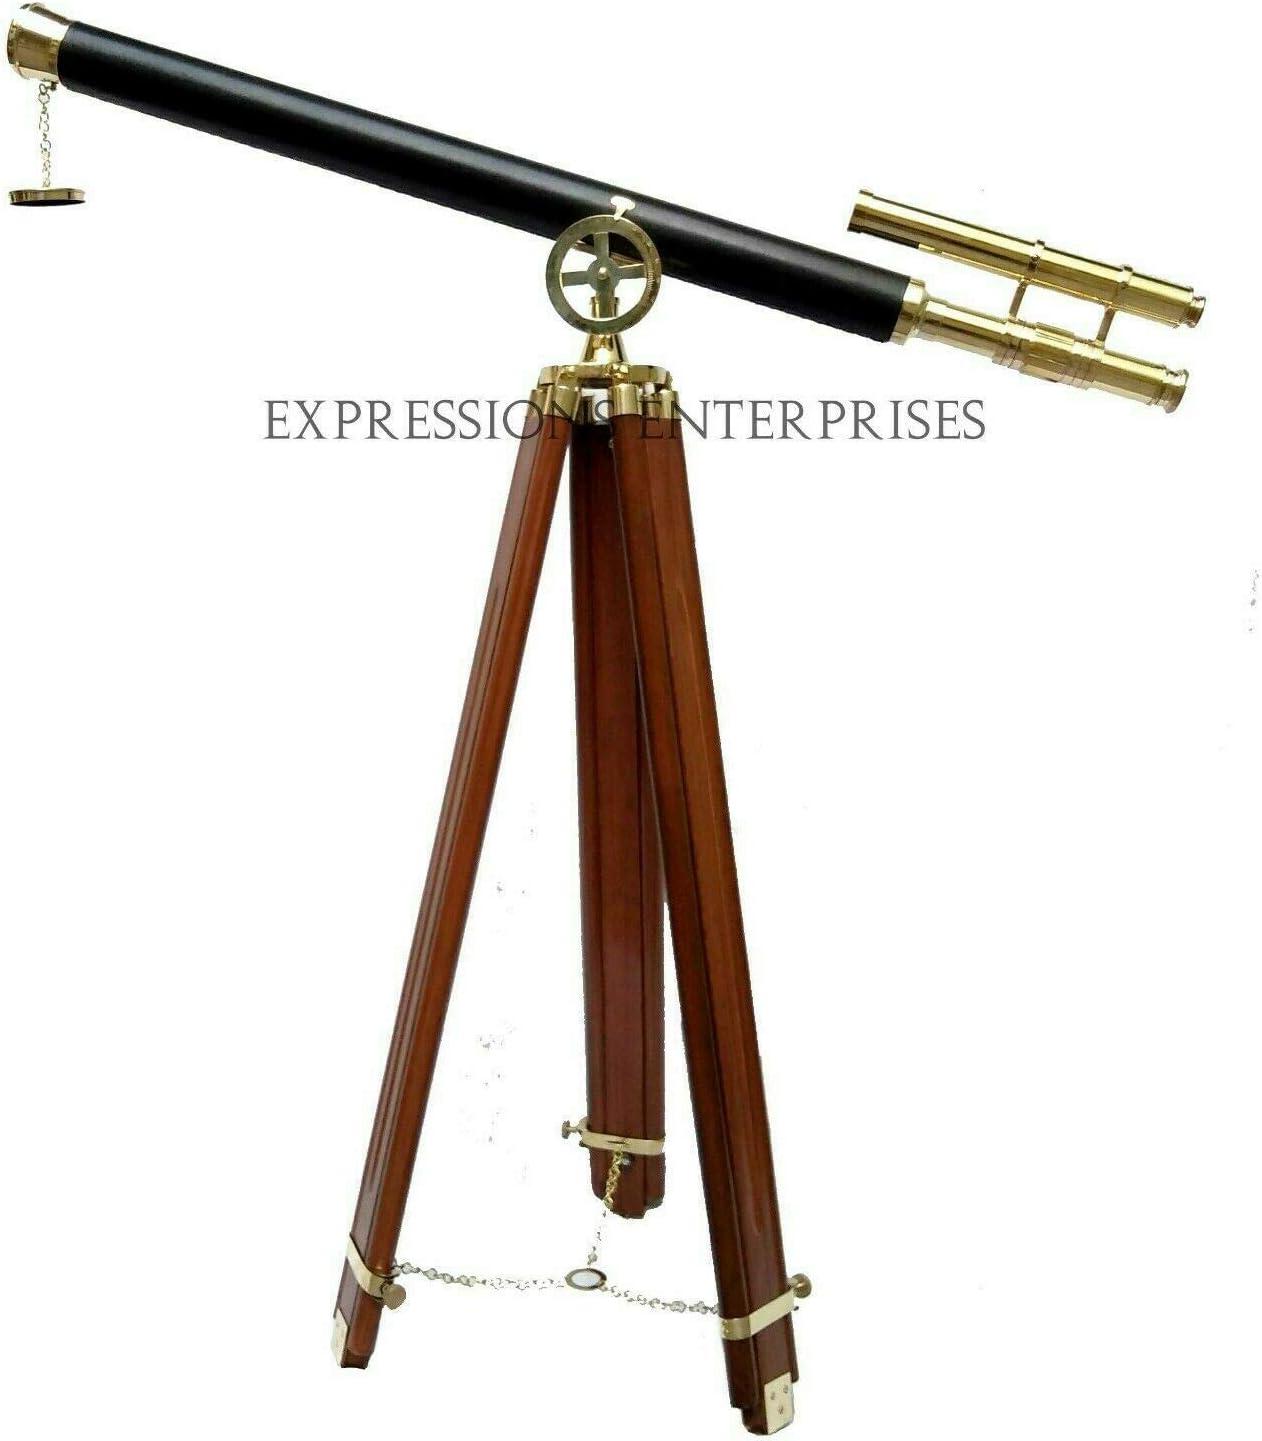 Marine Navy Brass Telescope w Wooden Tripod Polished Brass Astro Antique Style